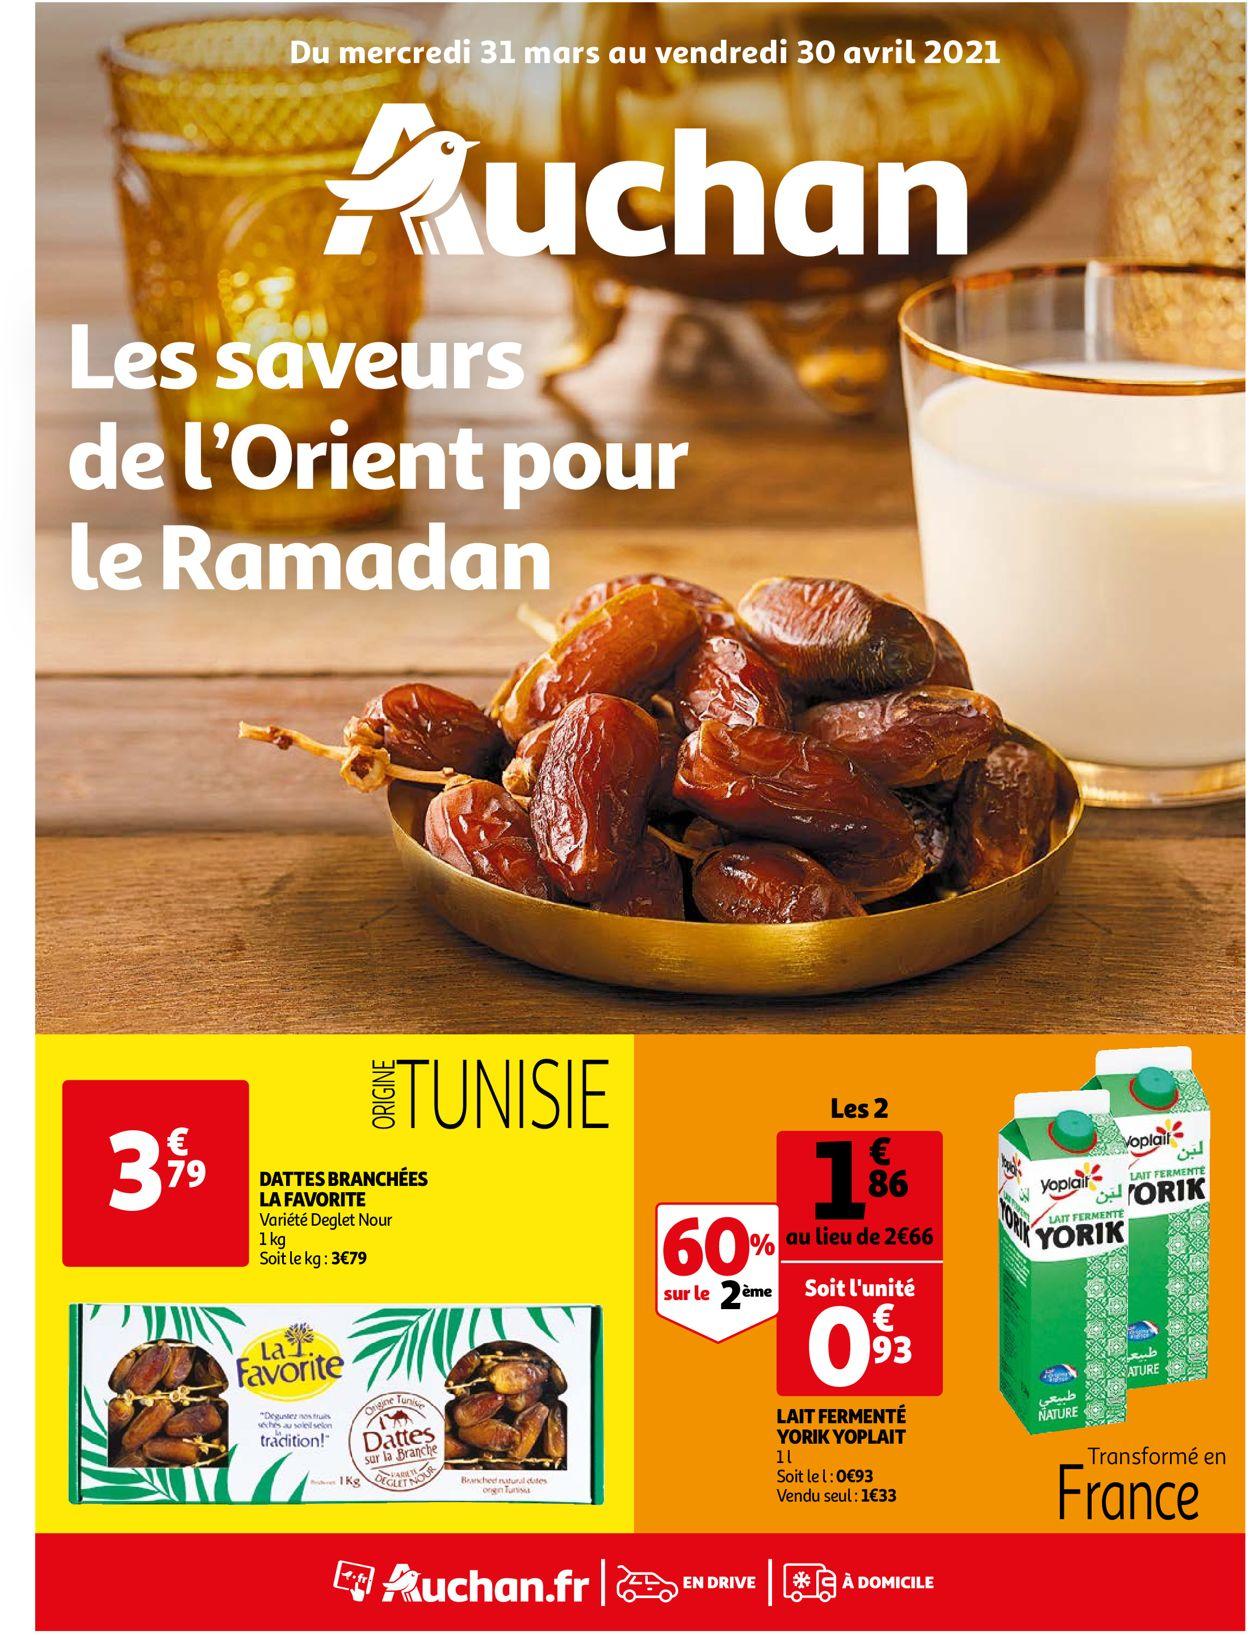 Auchan Catalogue - 31.03-30.04.2021